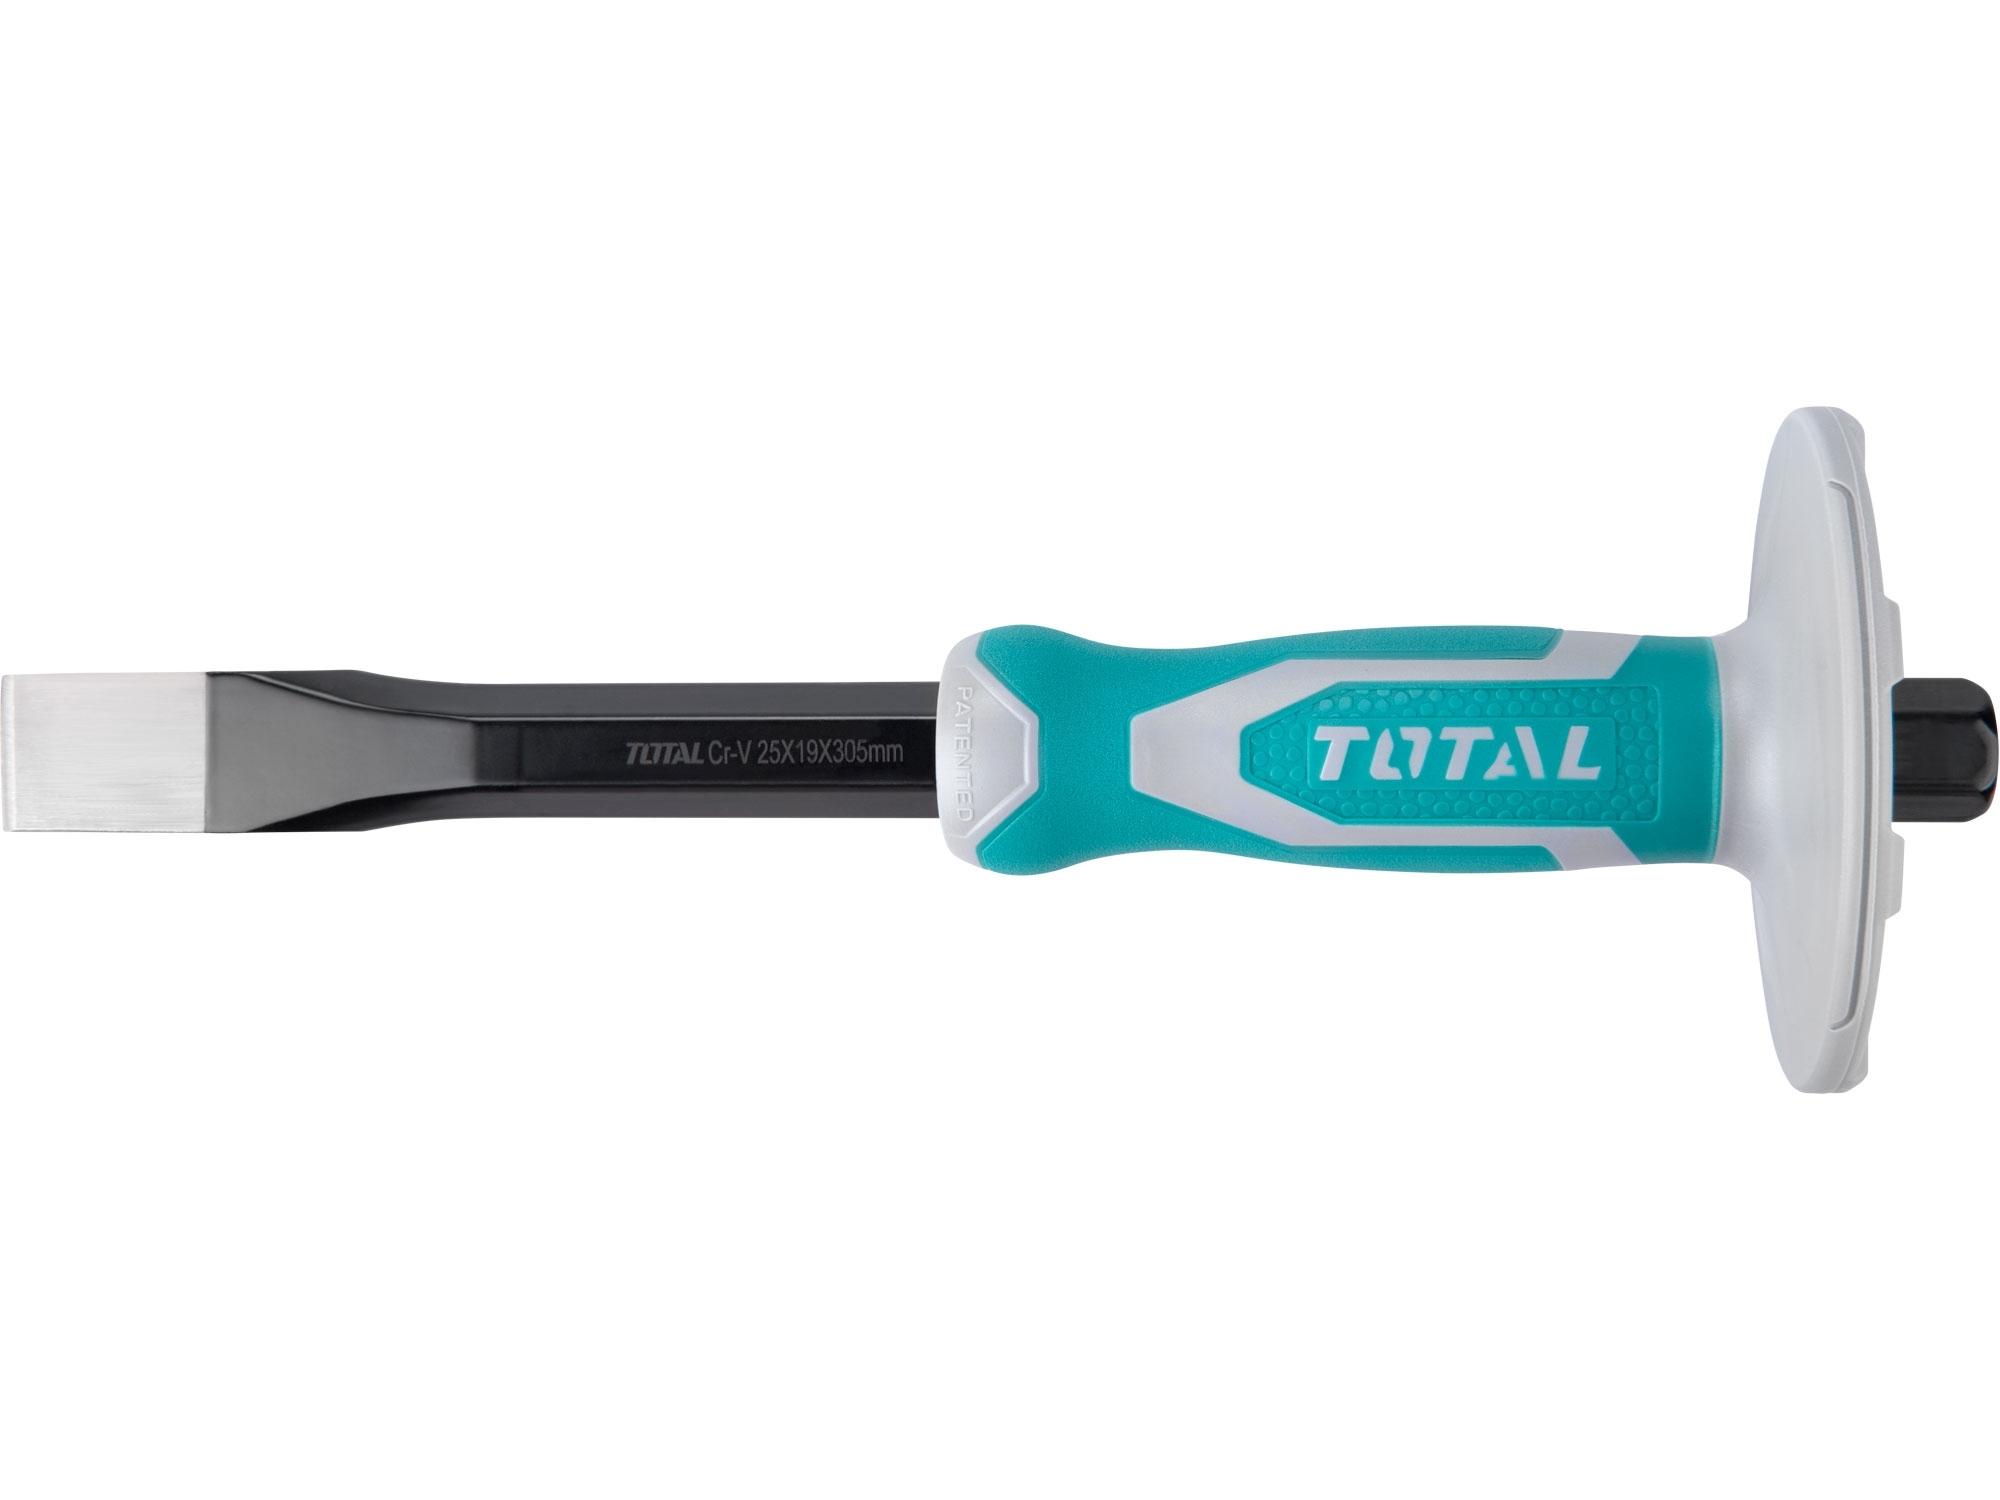 TOTAL THT4211216 sekáč plochý s plastovým chráničem, industrial, šířka ostří 25mm, délka 305mm